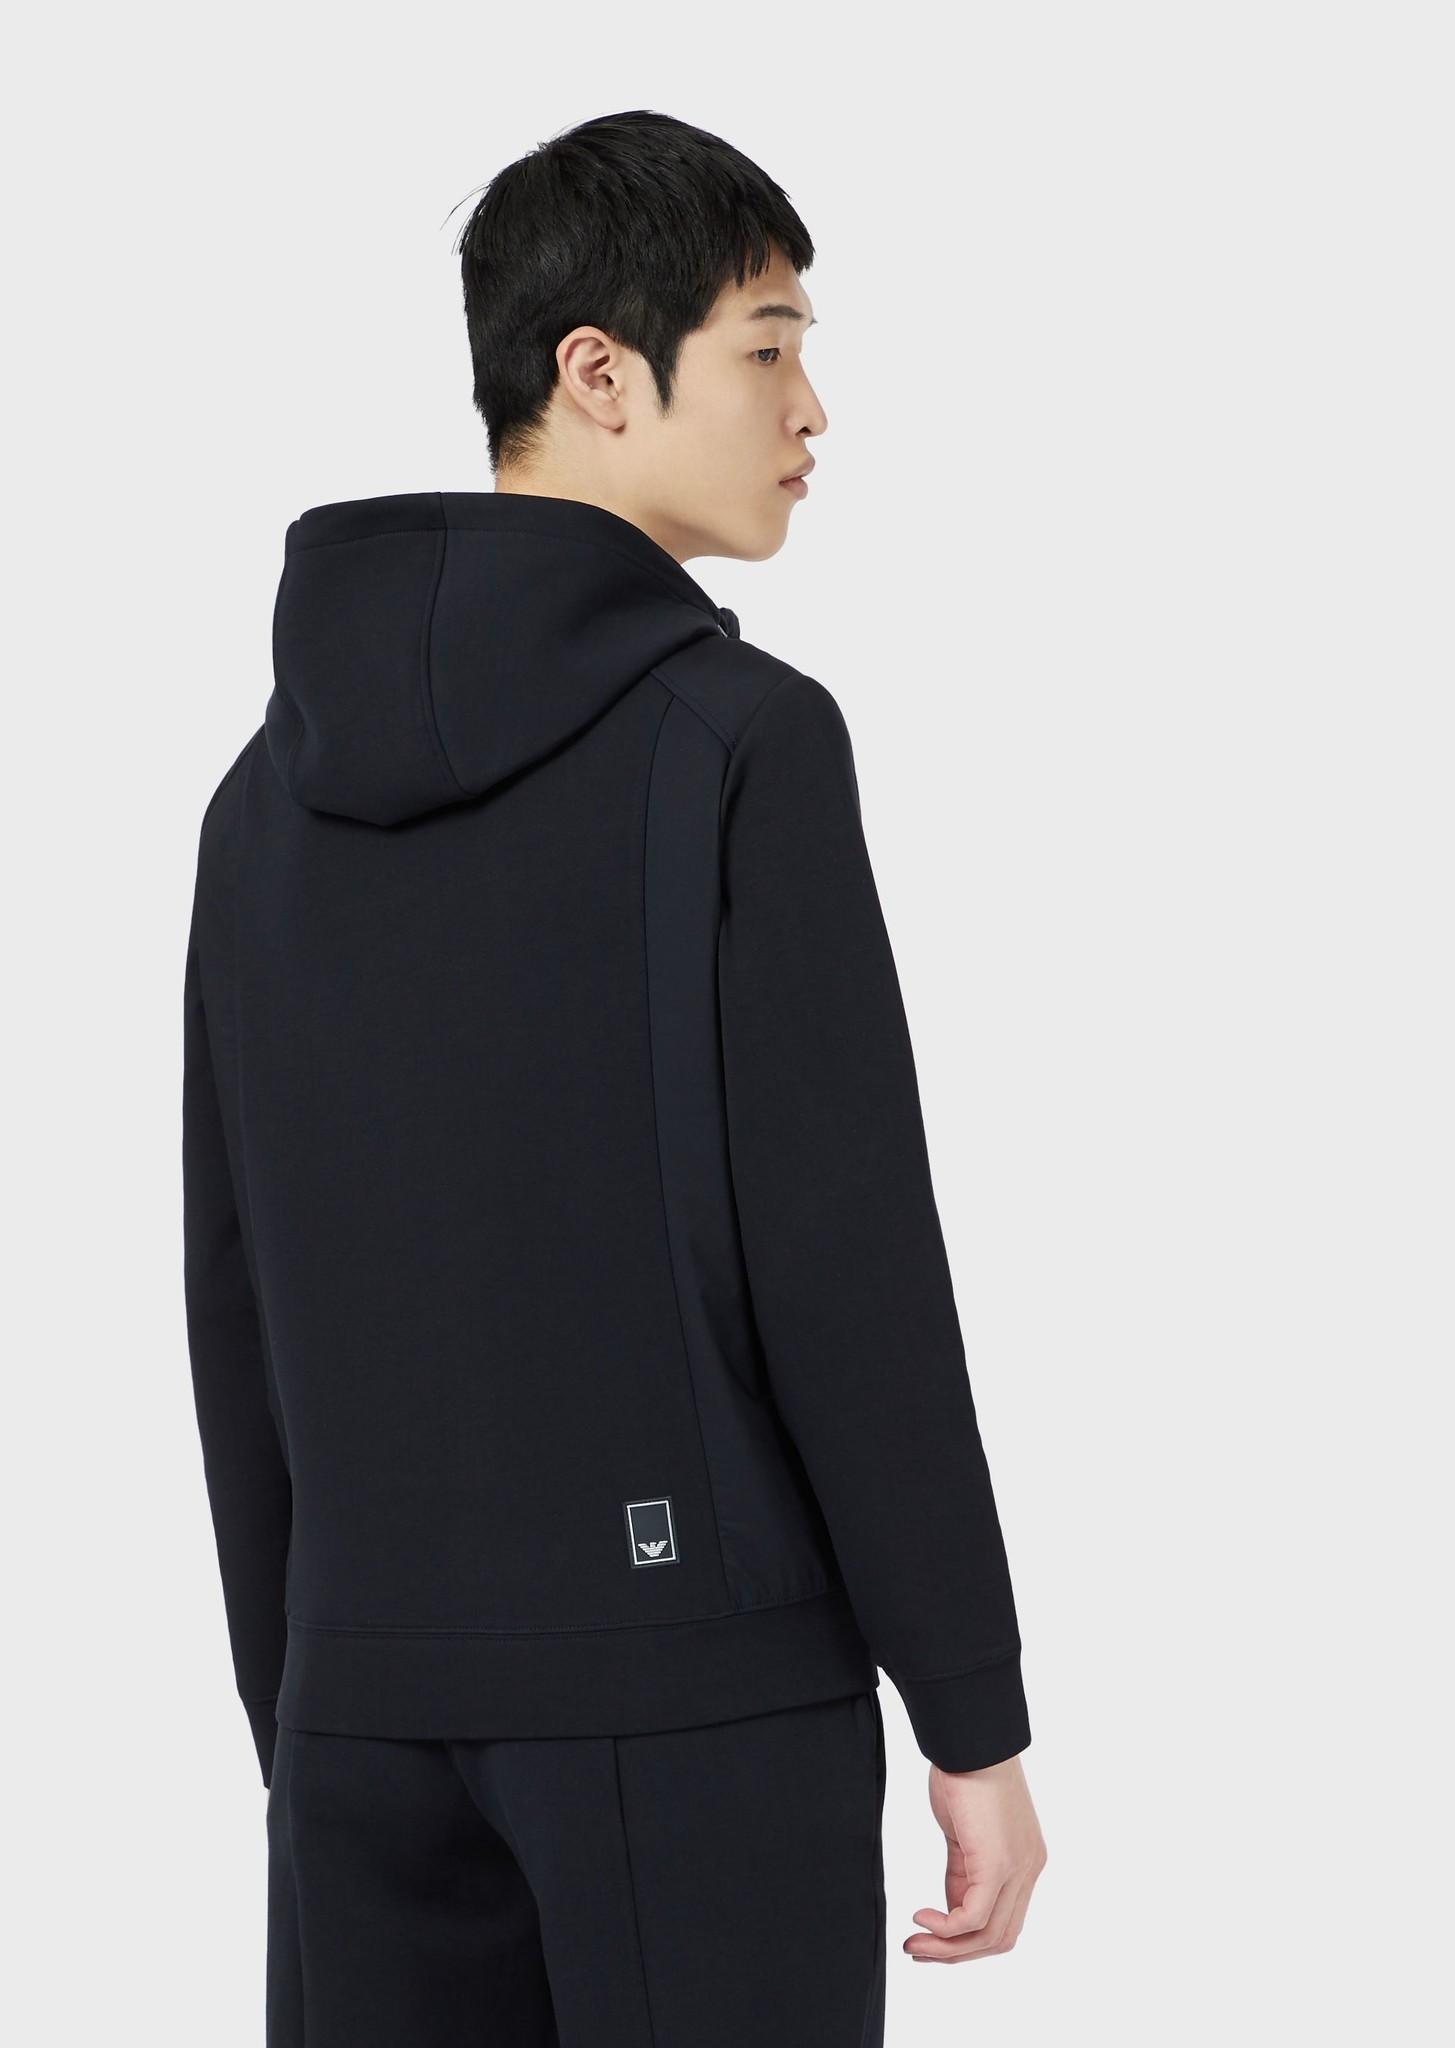 Travel Essentials Hooded Sweatshirt-3